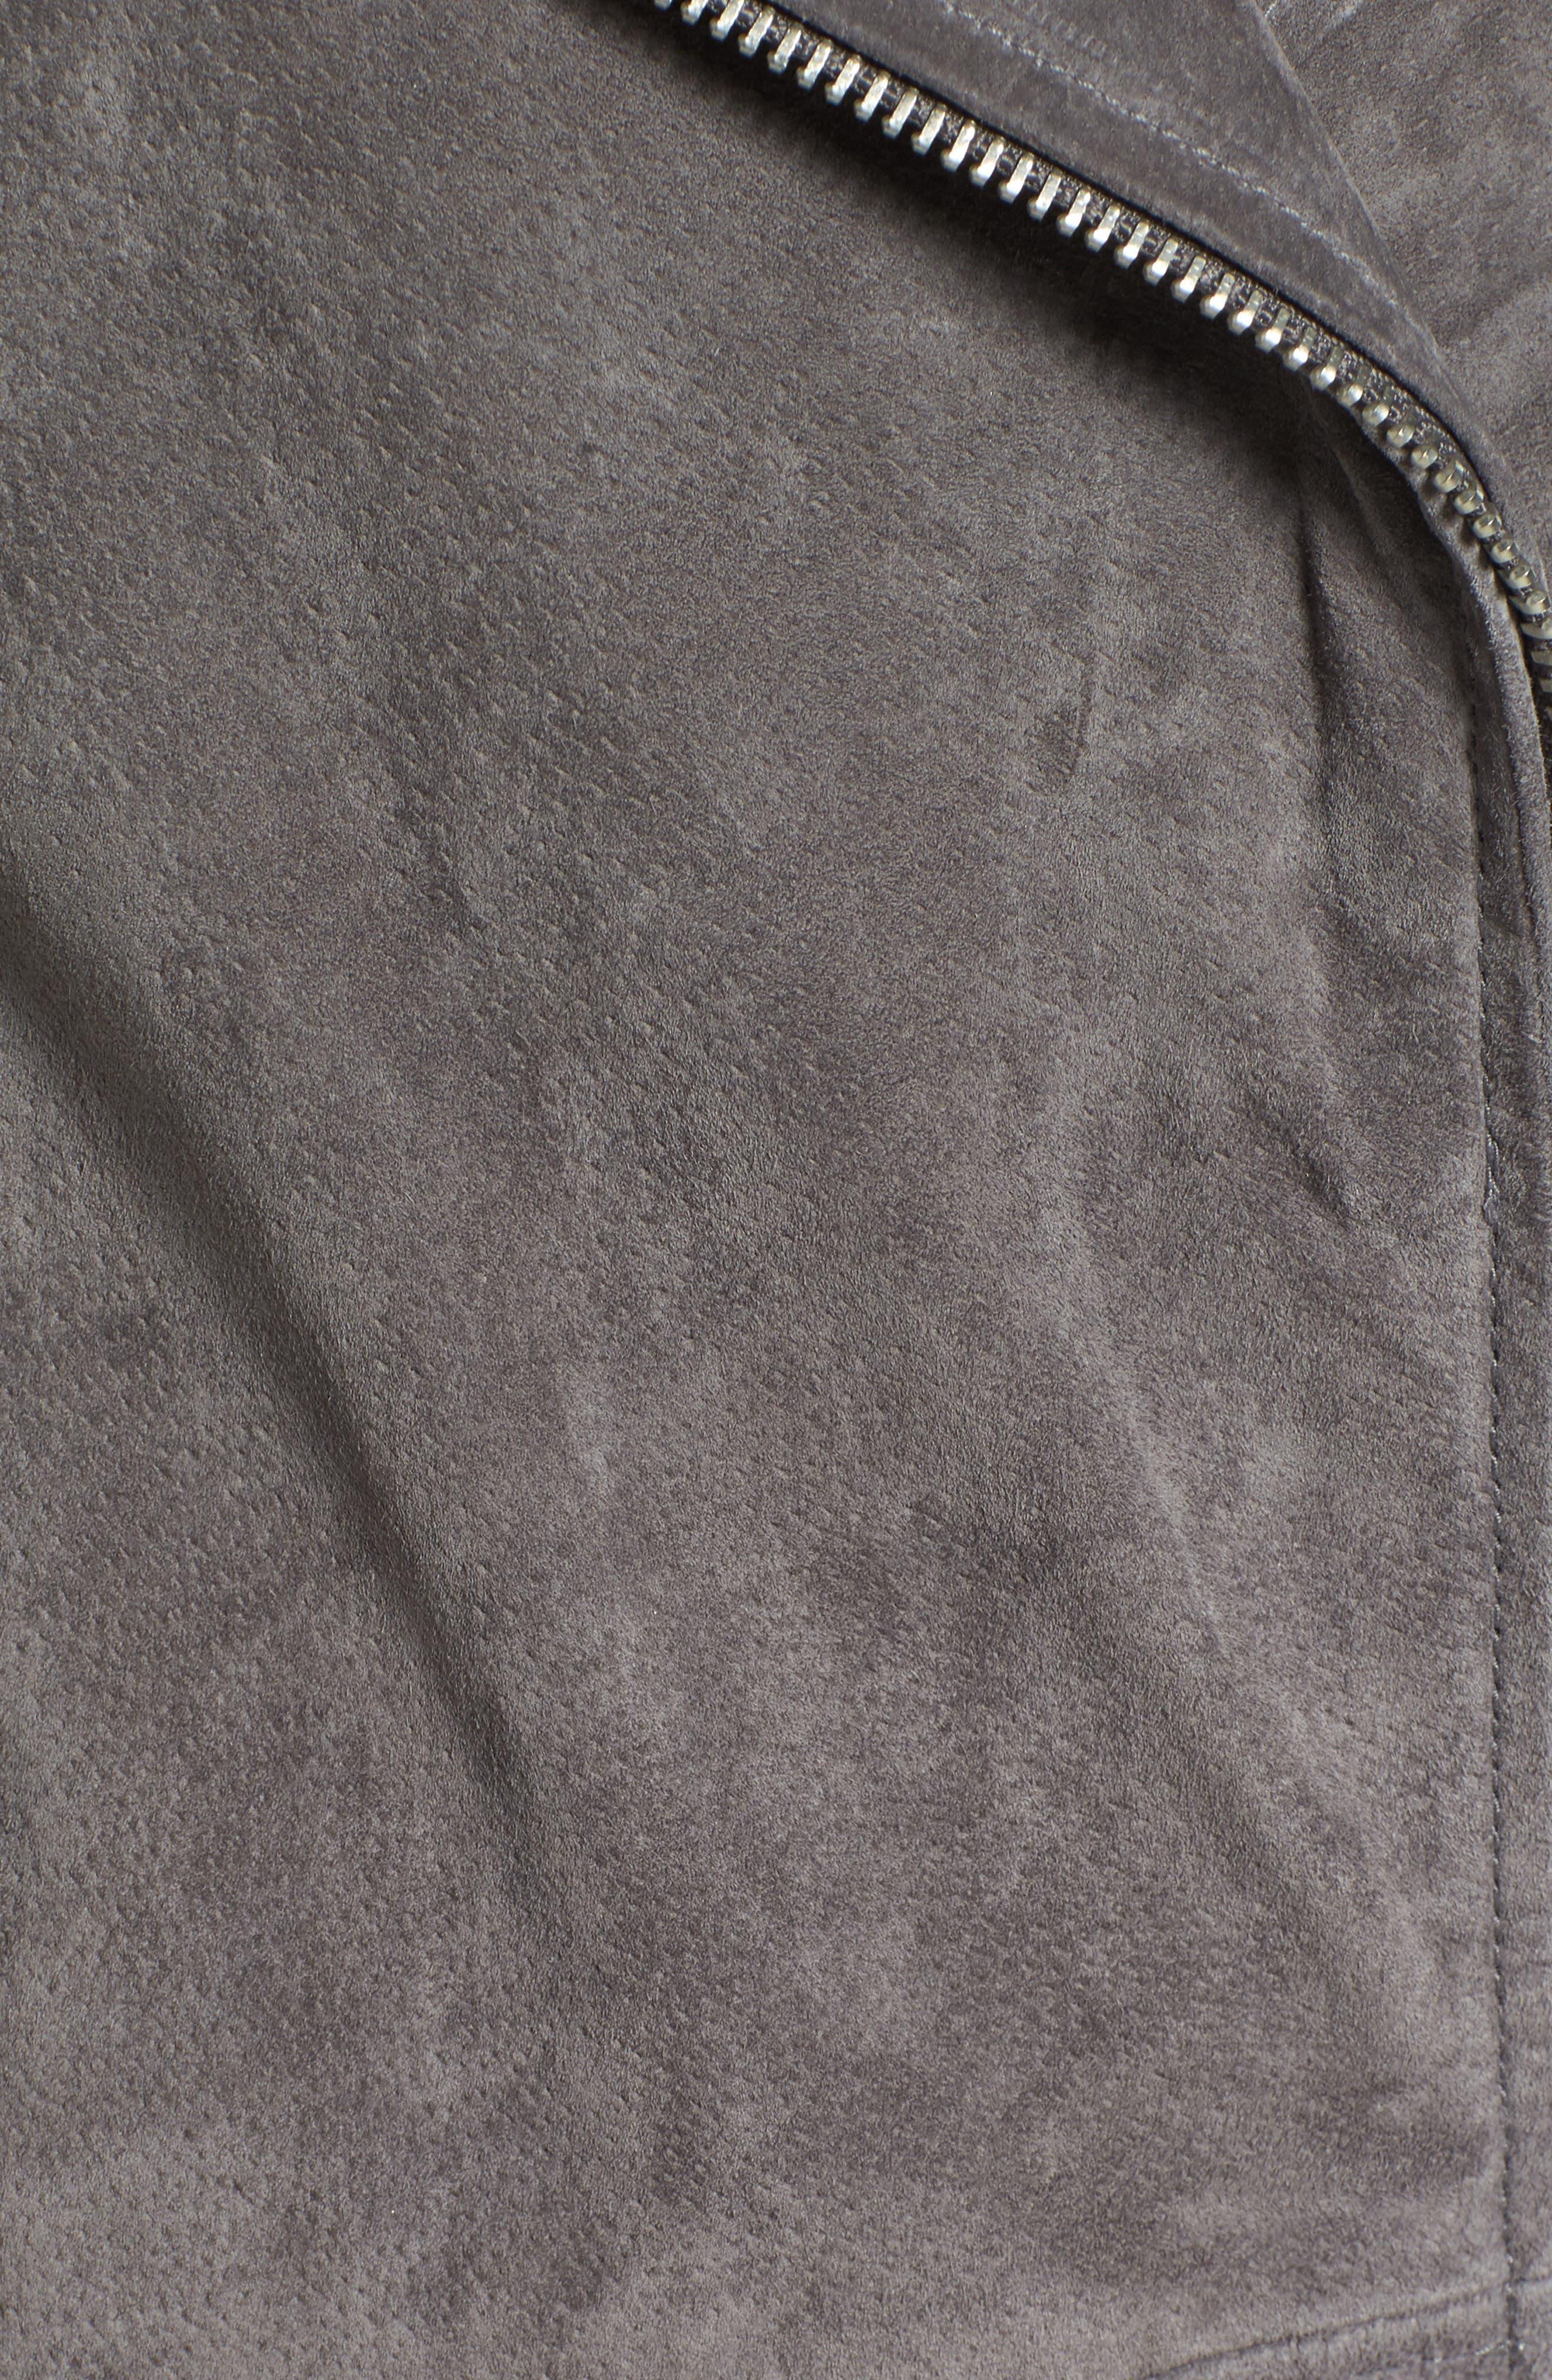 Suede Moto Jacket,                             Alternate thumbnail 51, color,